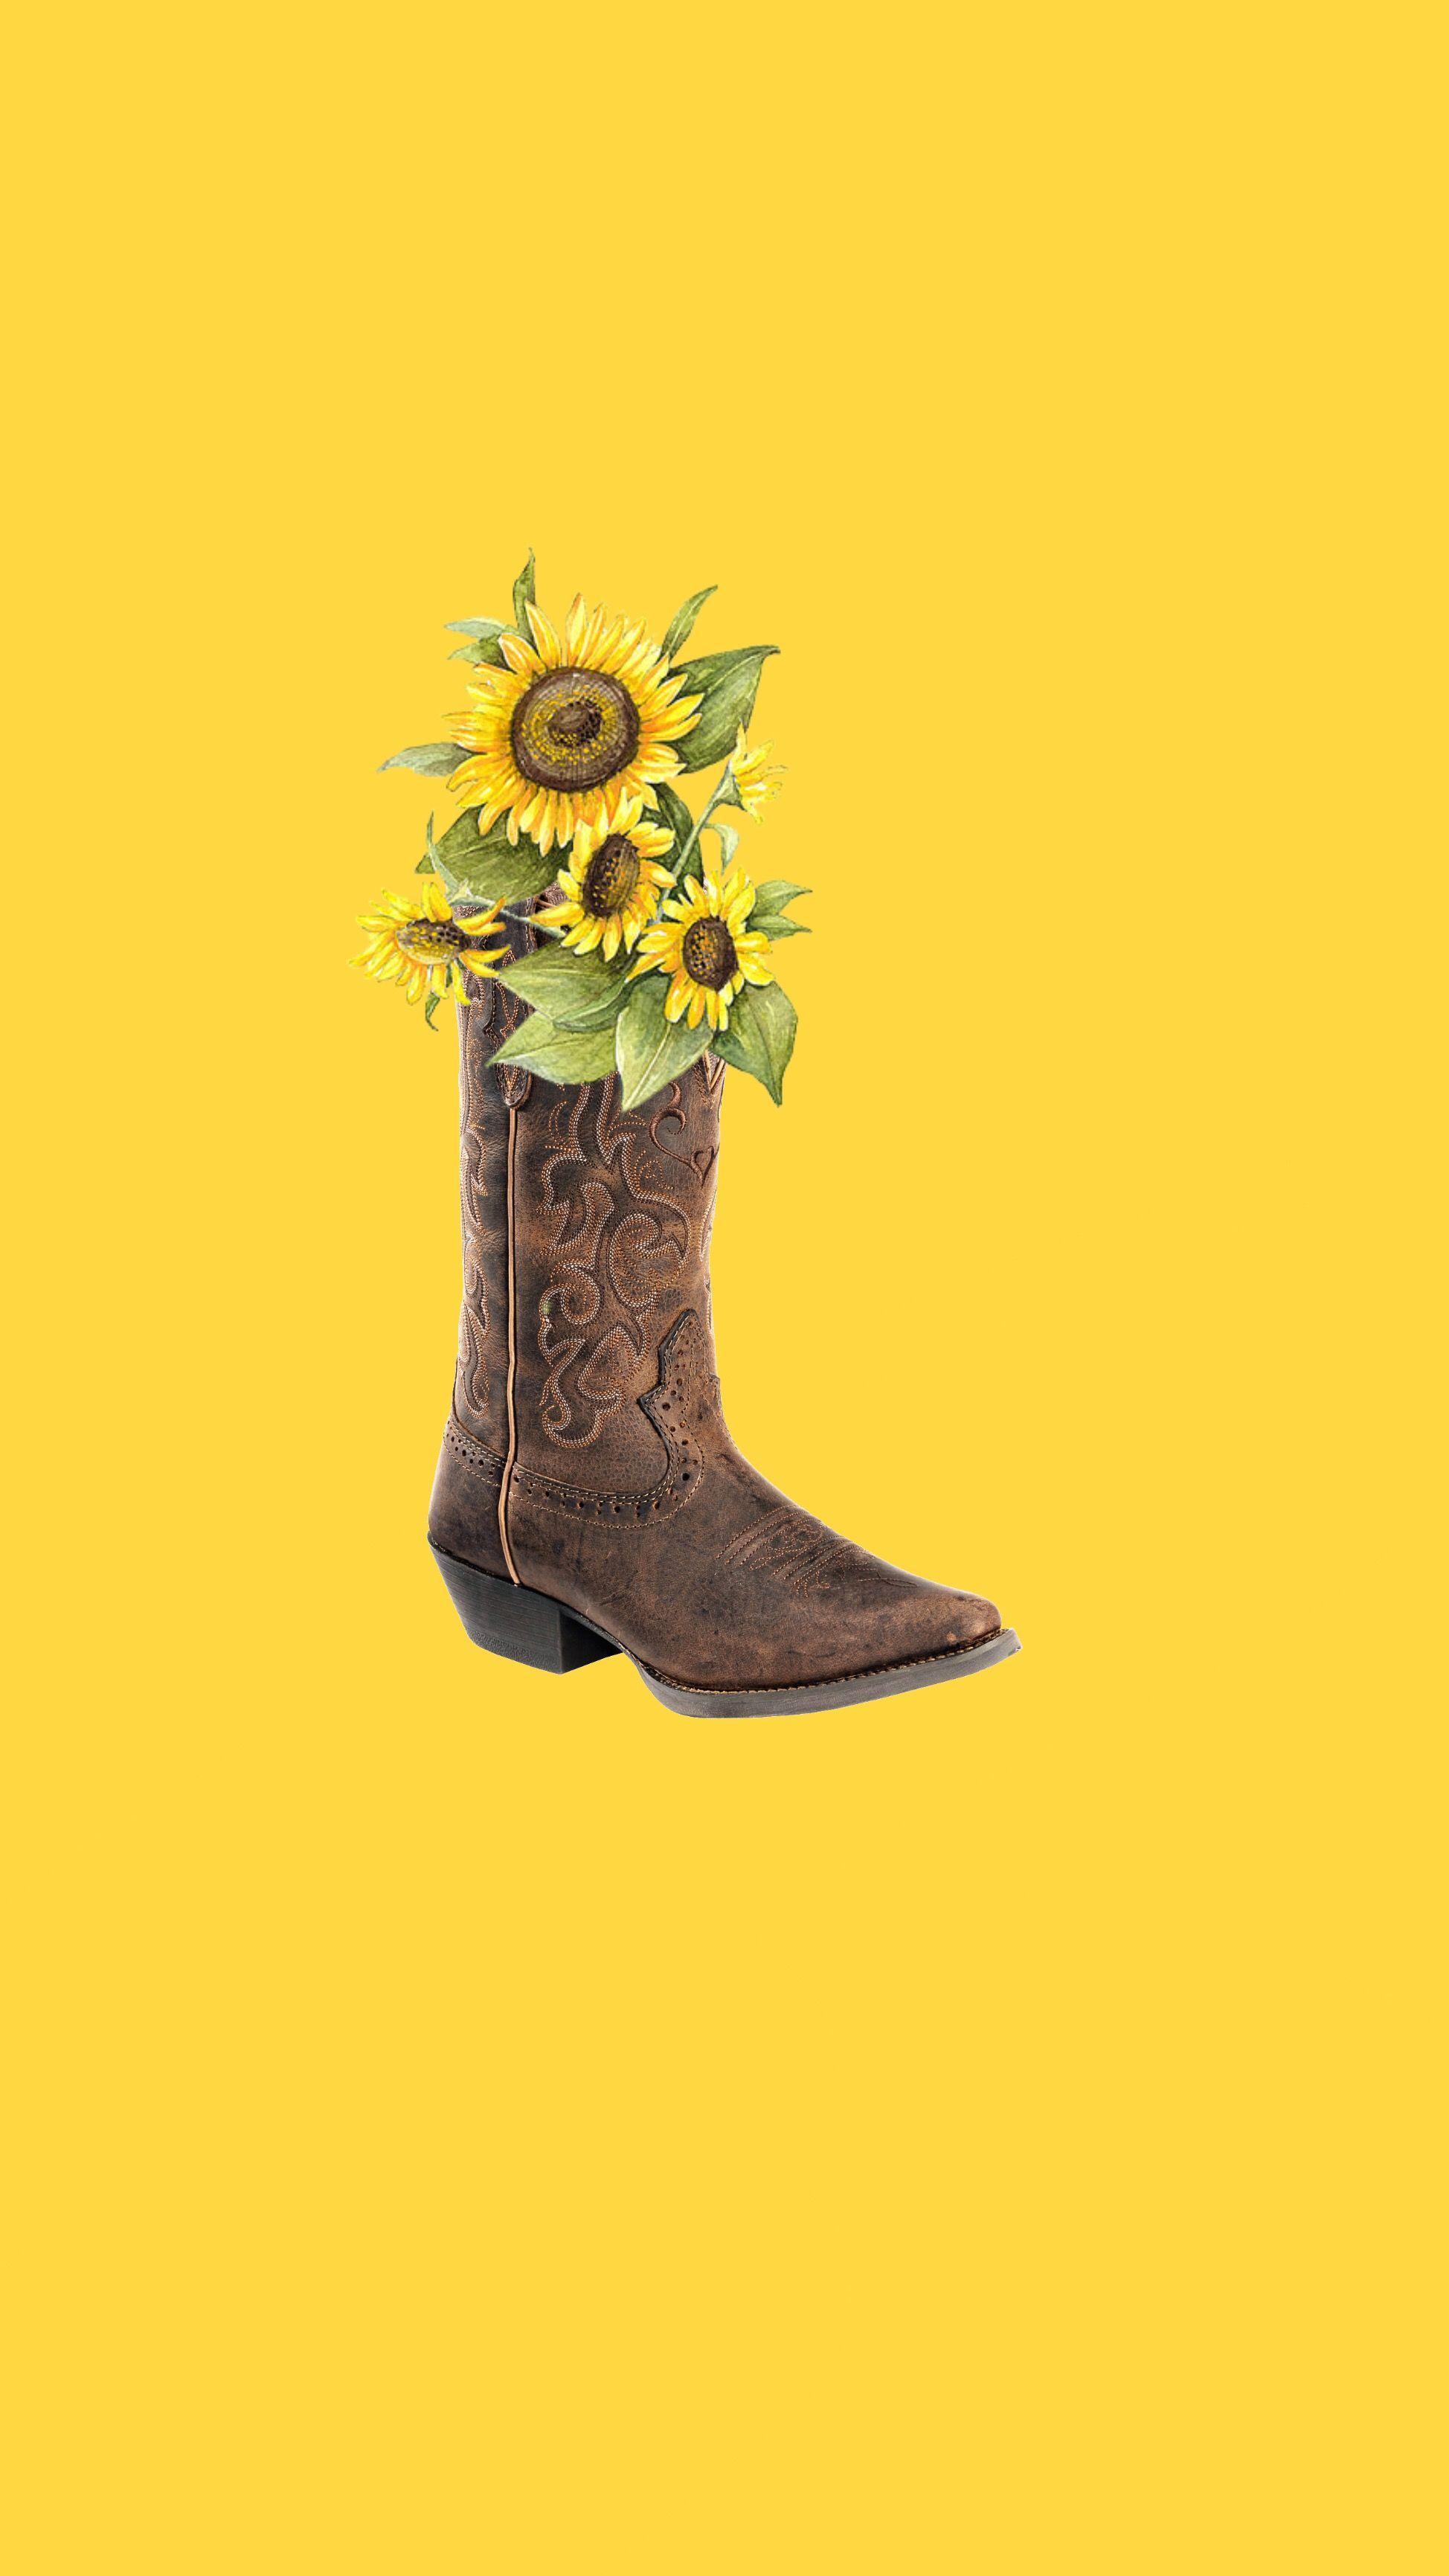 Cowgirl Sunflower Boots Iphone Wallpaper Sunflower Iphone Wallpaper Iphone Wallpaper Images Sunflower Wallpaper